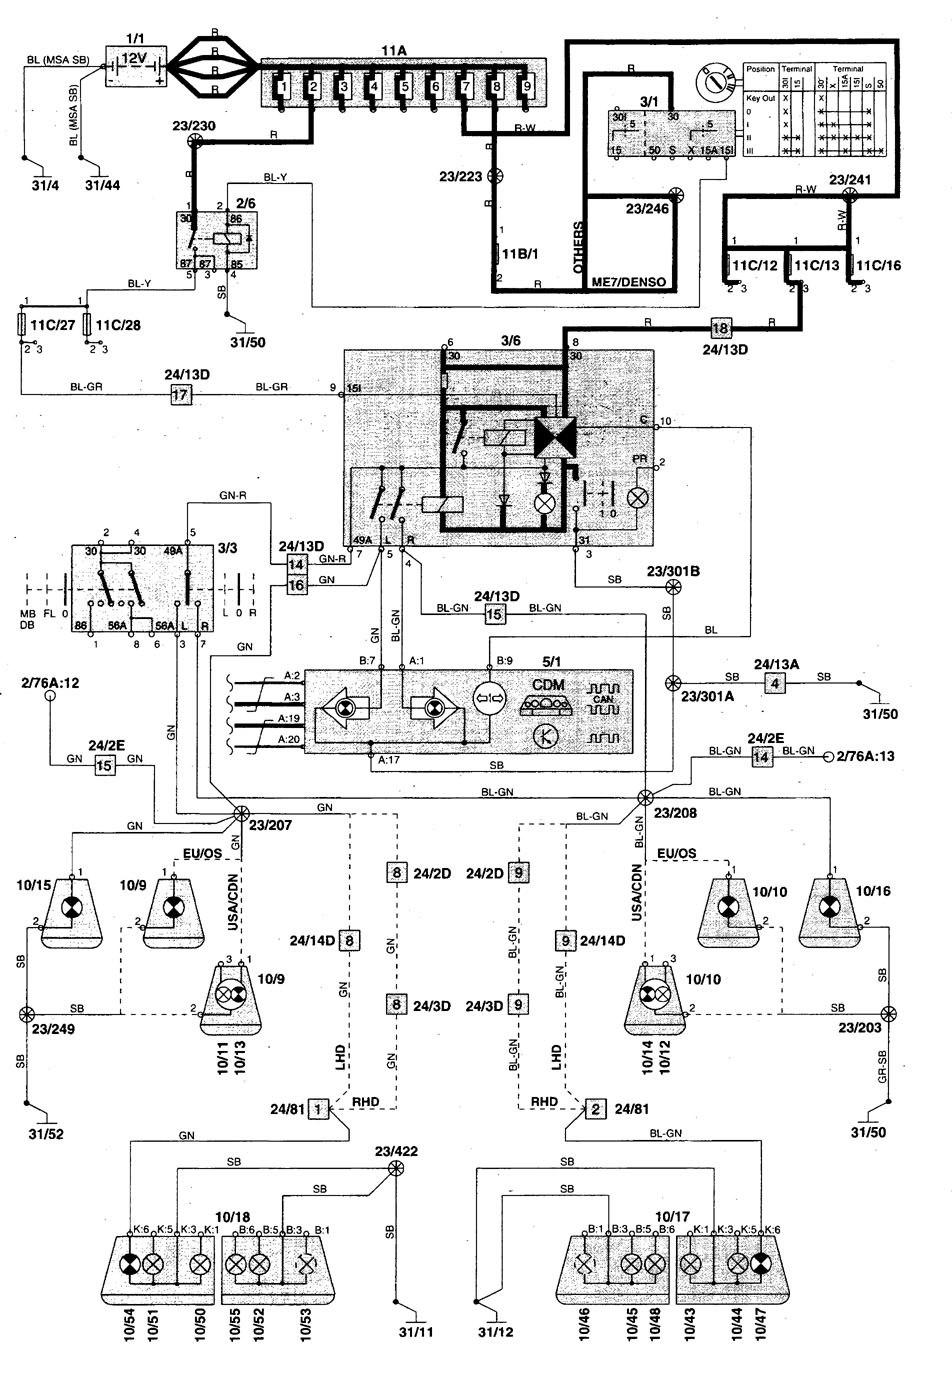 1998 volvo v70 ignition switch wiring diagram